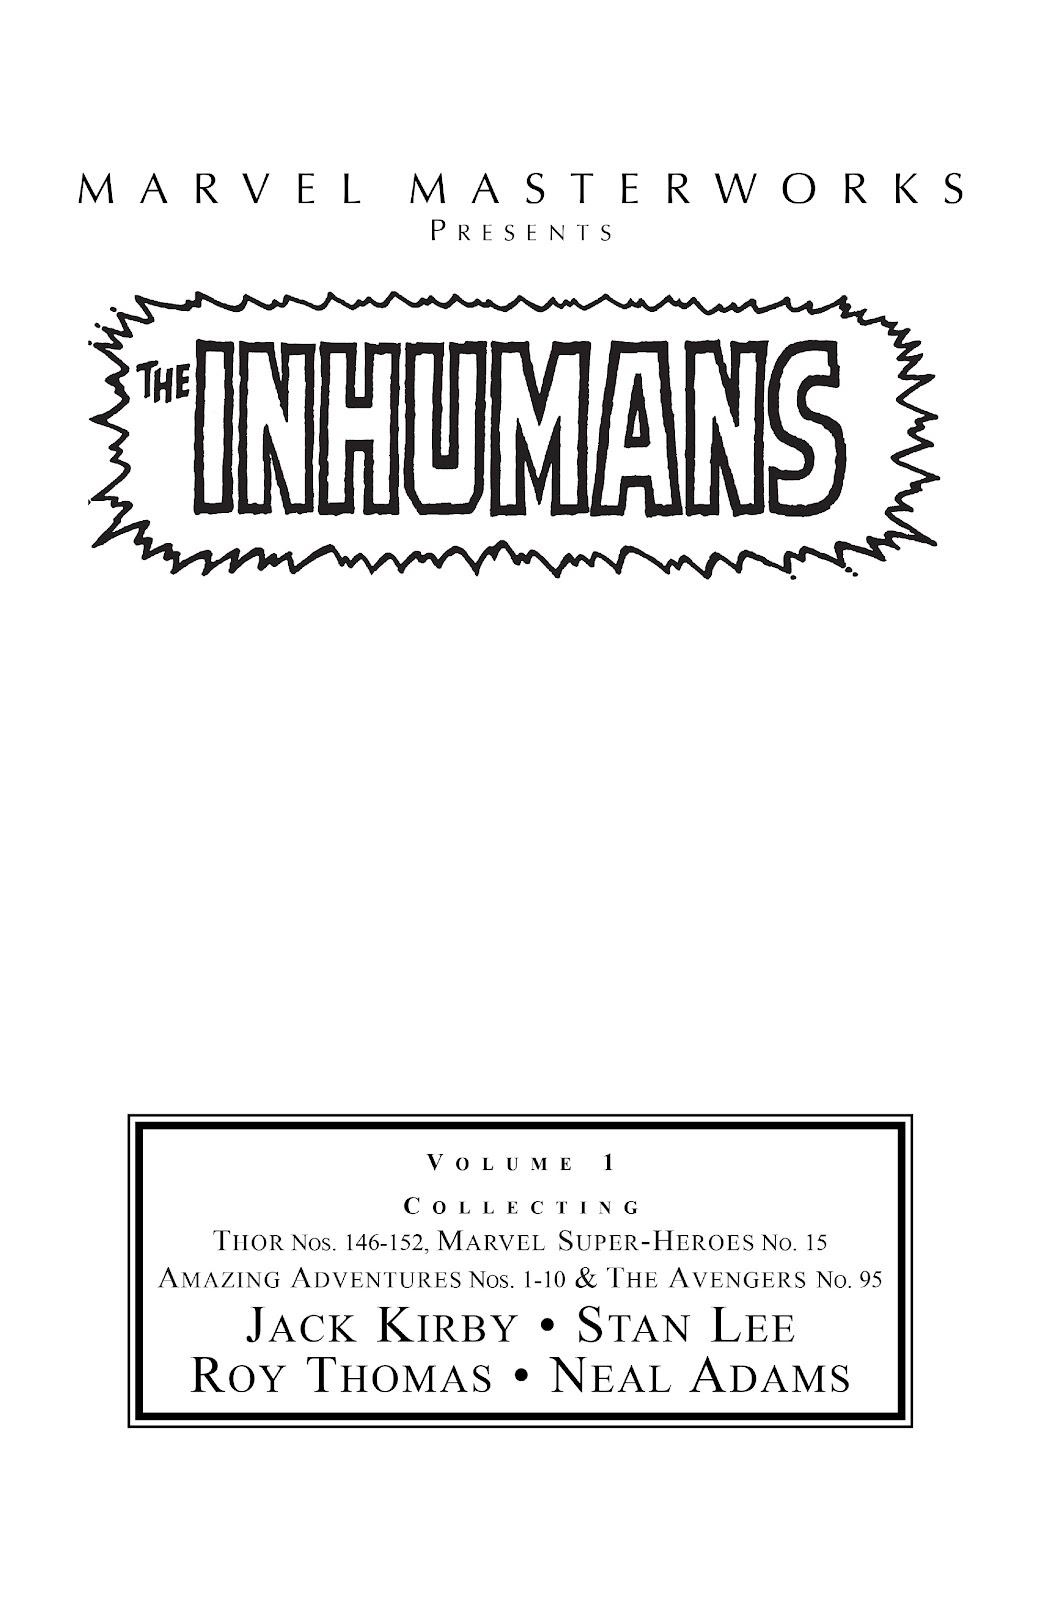 Read online Marvel Masterworks: The Inhumans comic -  Issue # TPB 1 (Part 1) - 2